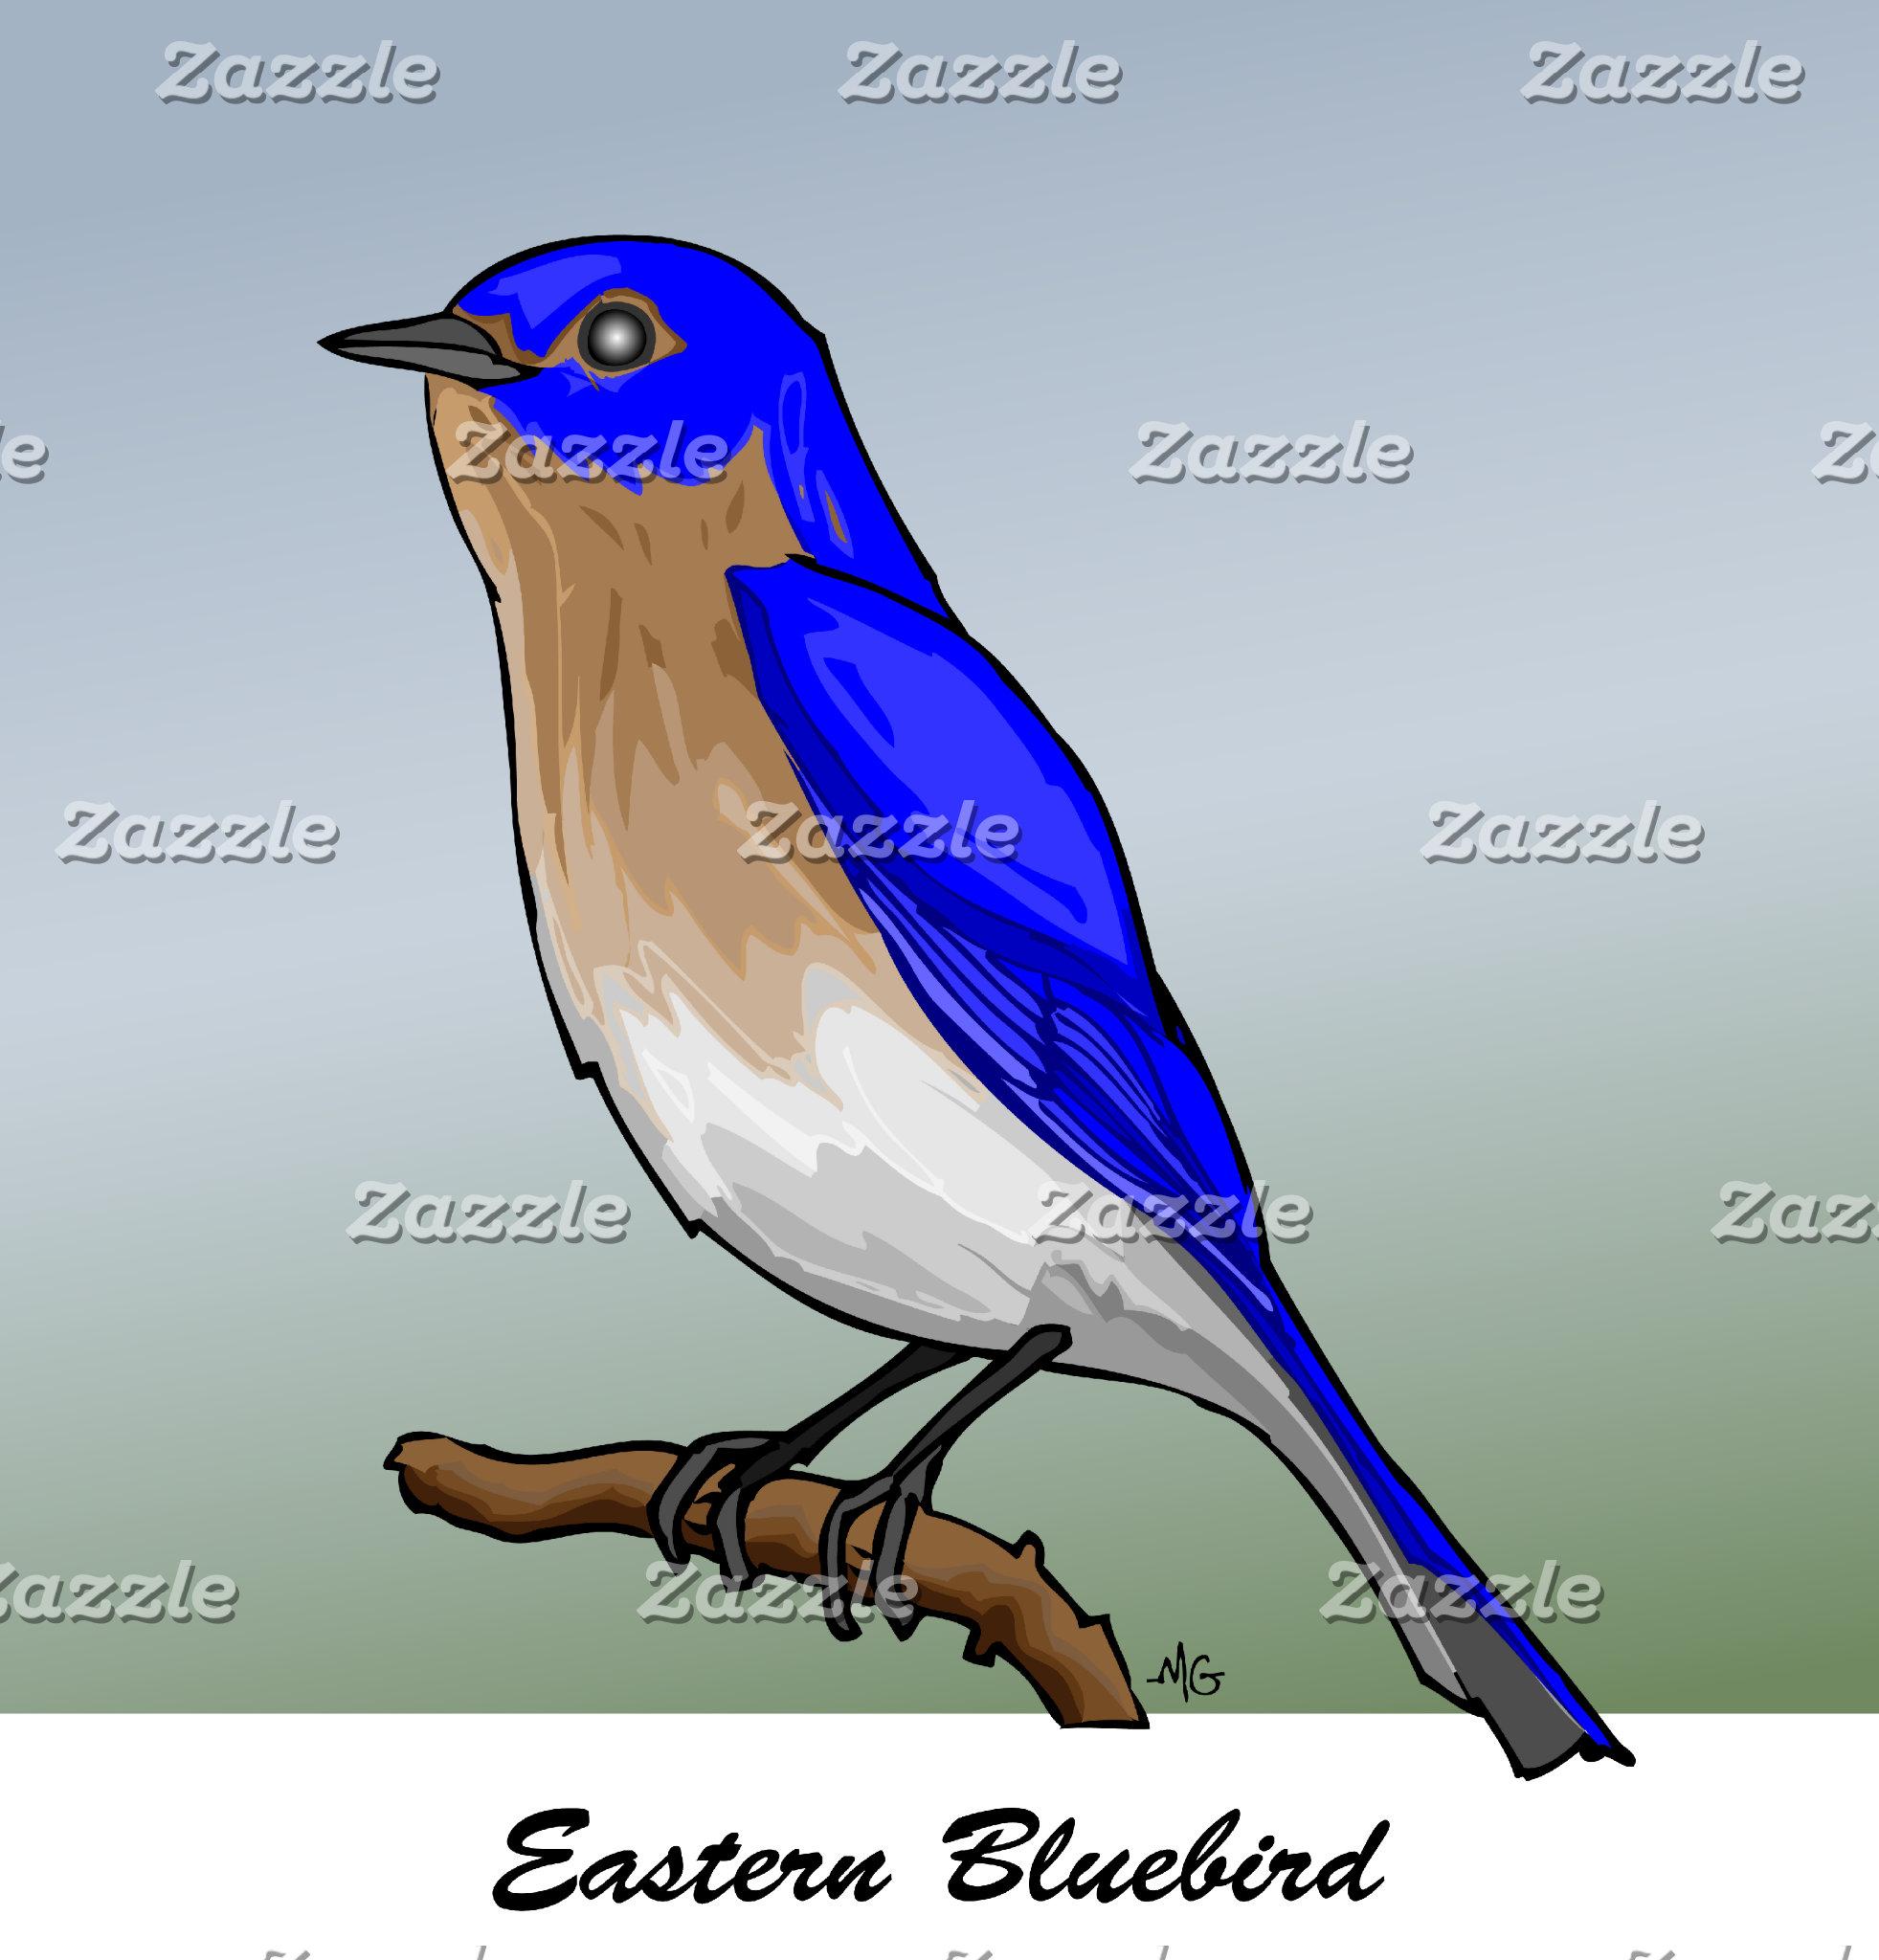 EASTERN BLUEBIRD rev.2.0